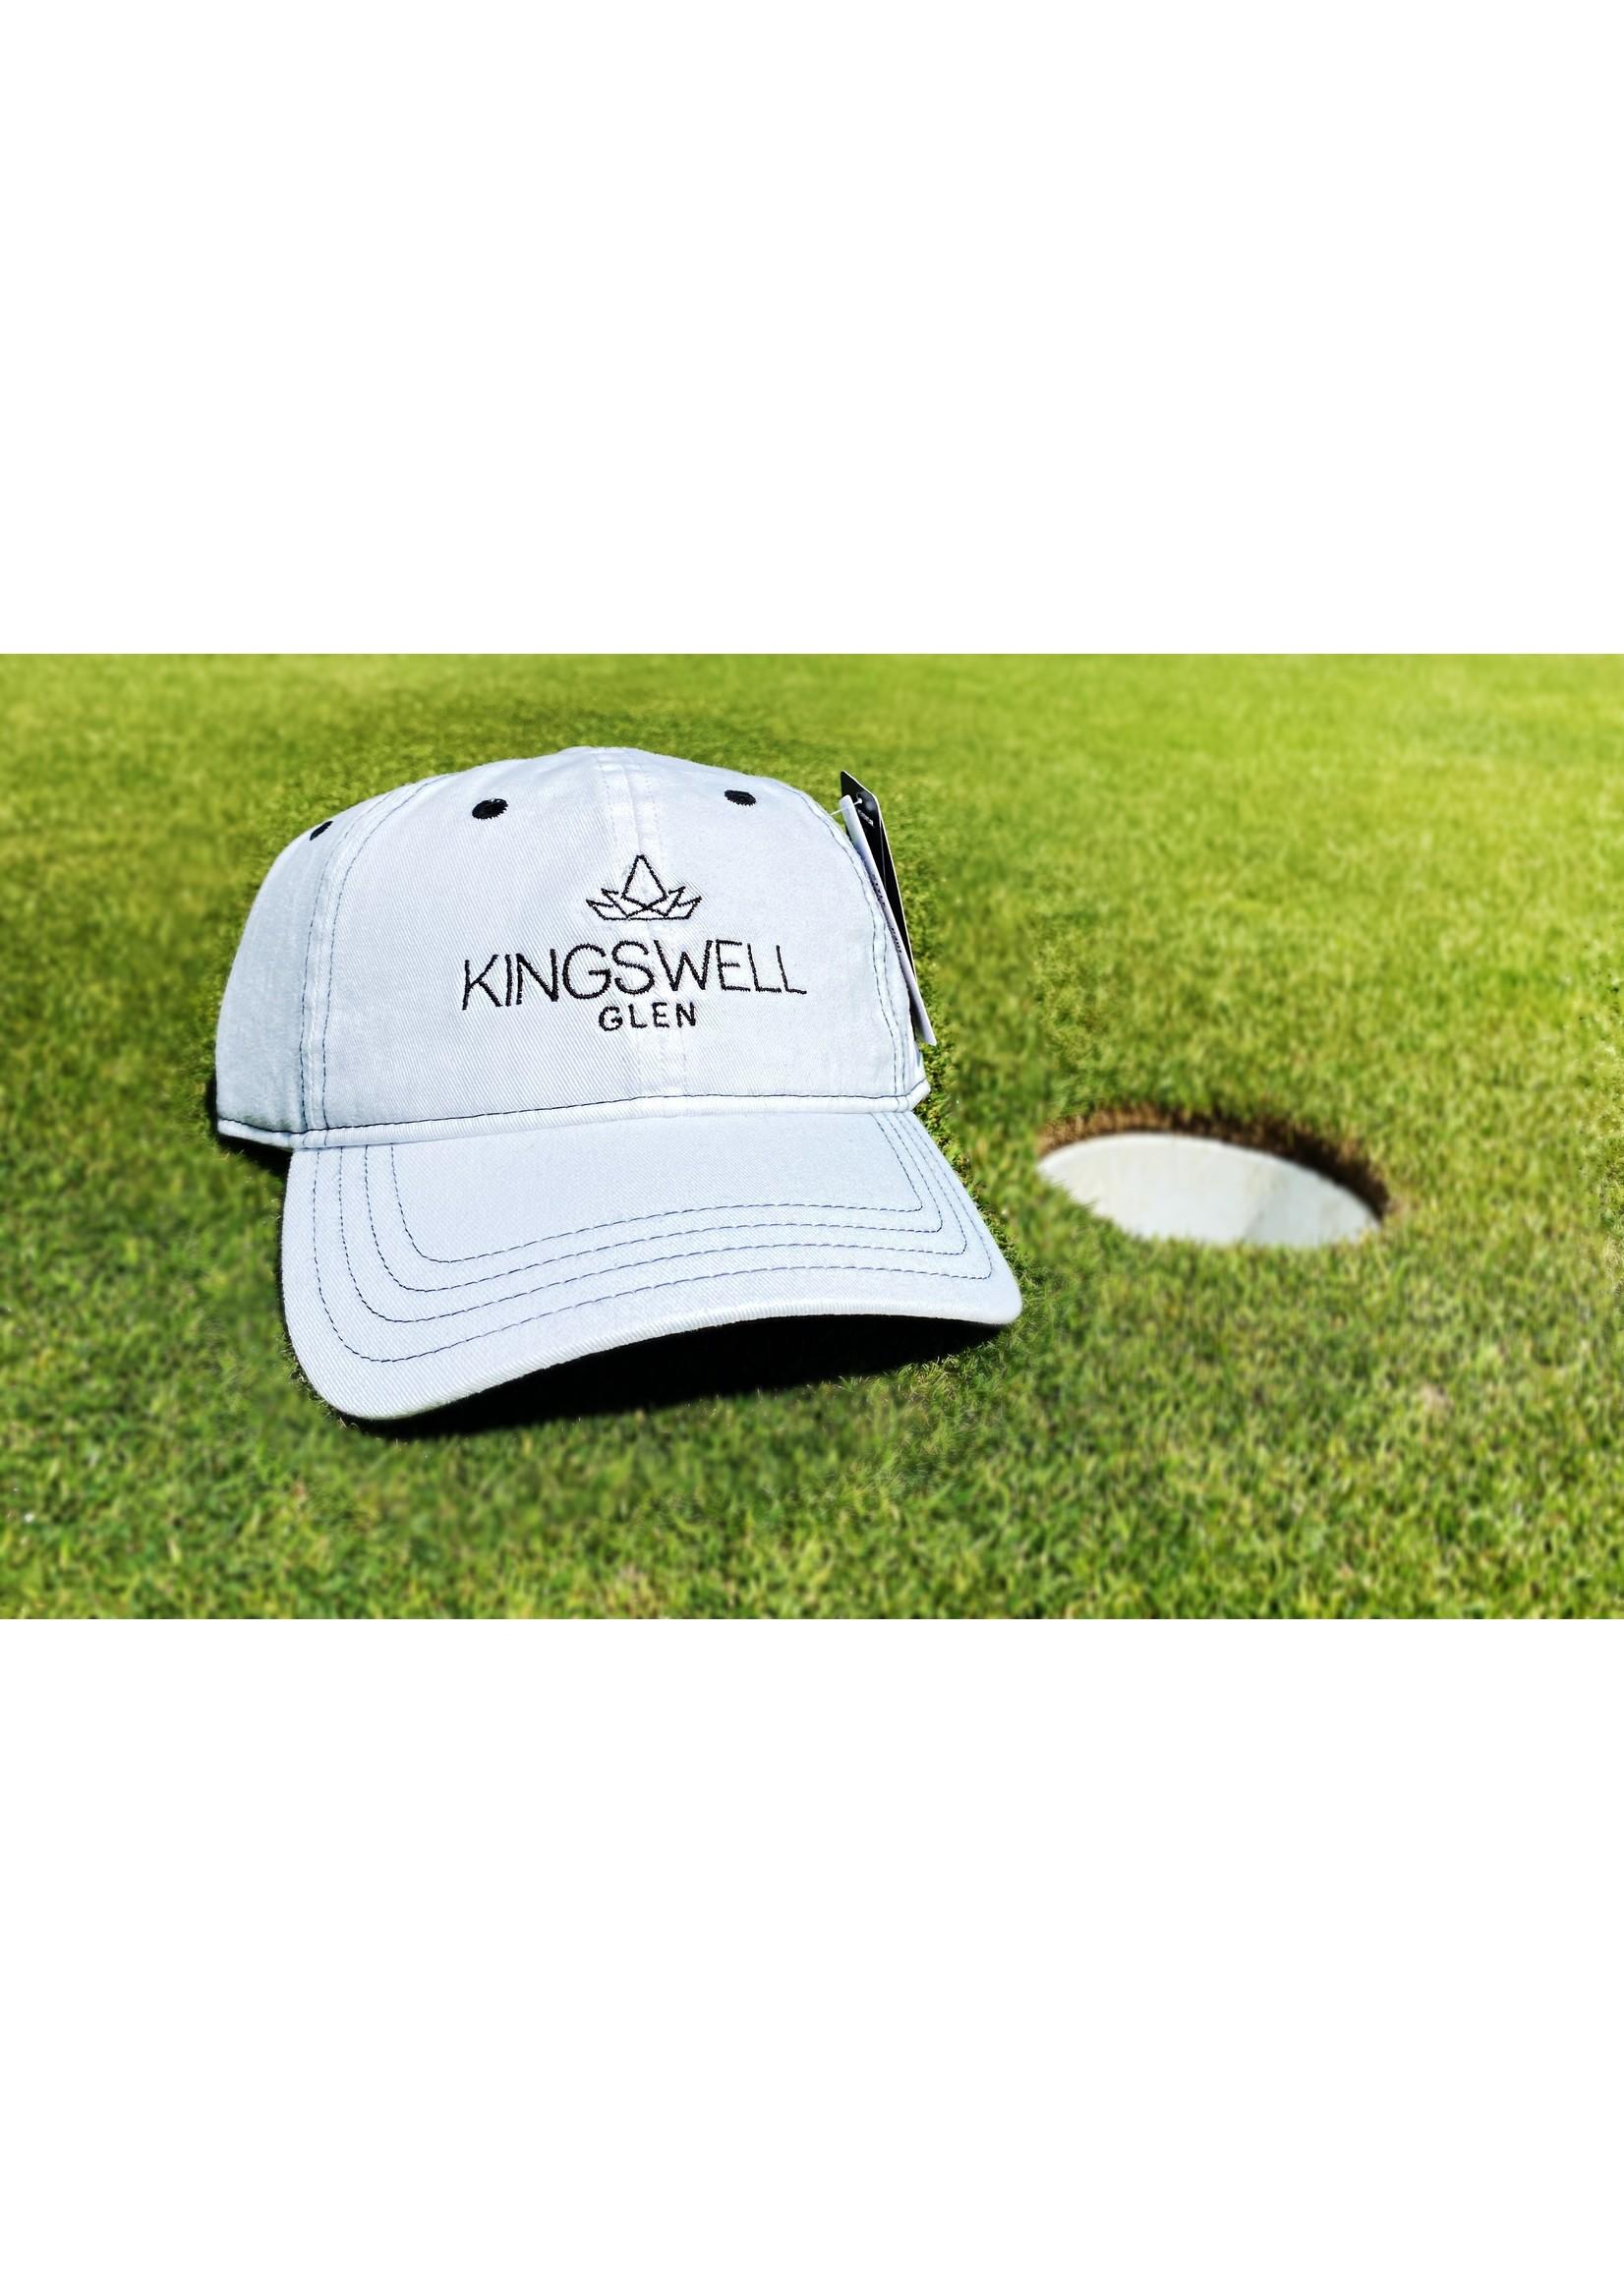 KINGSWELL GLEN Prodigy Hat